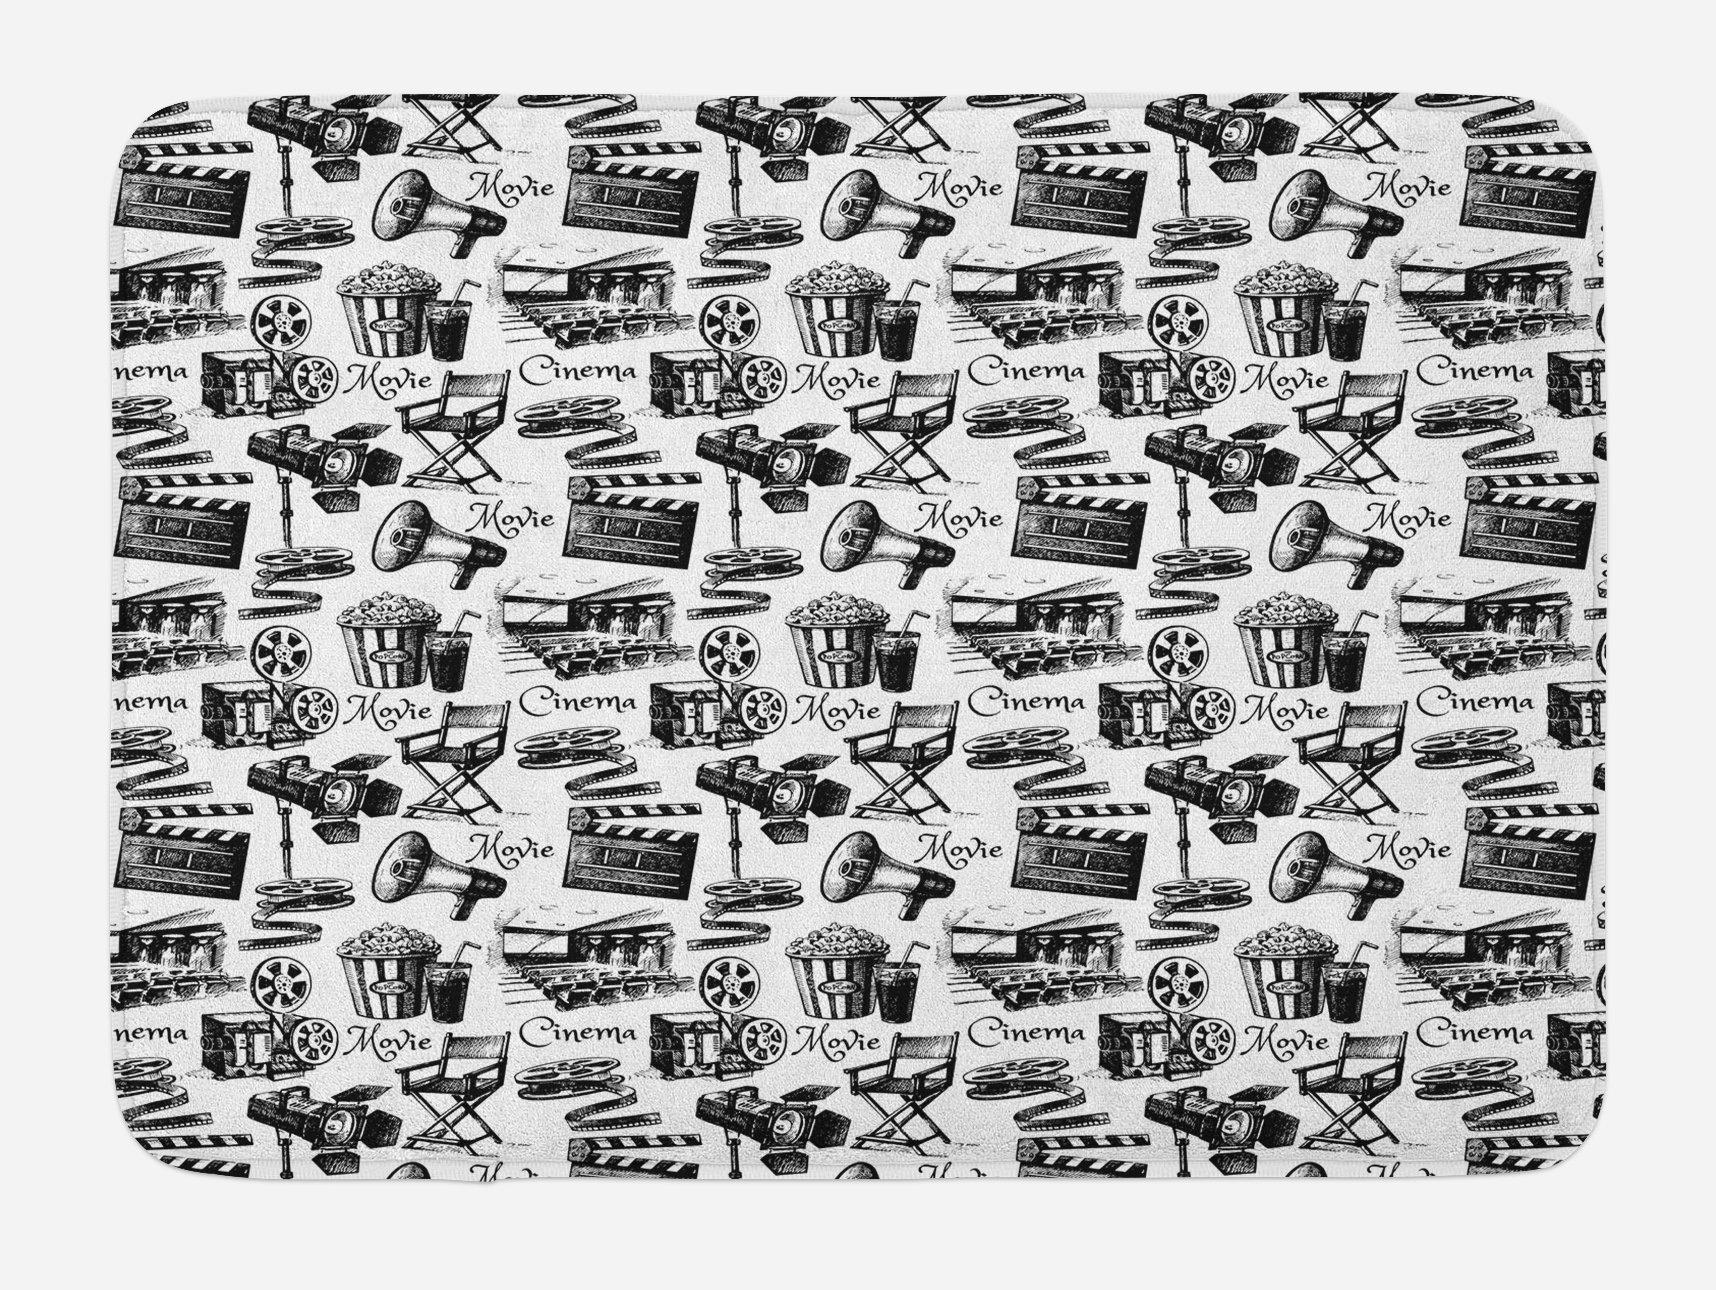 Lunarable Movie Bath Mat, Vintage Artful Film Cinema Icons Motion Camera Action Record Graphic Style Print, Plush Bathroom Decor Mat with Non Slip Backing, 29.5 W X 17.5 W Inches, Black White